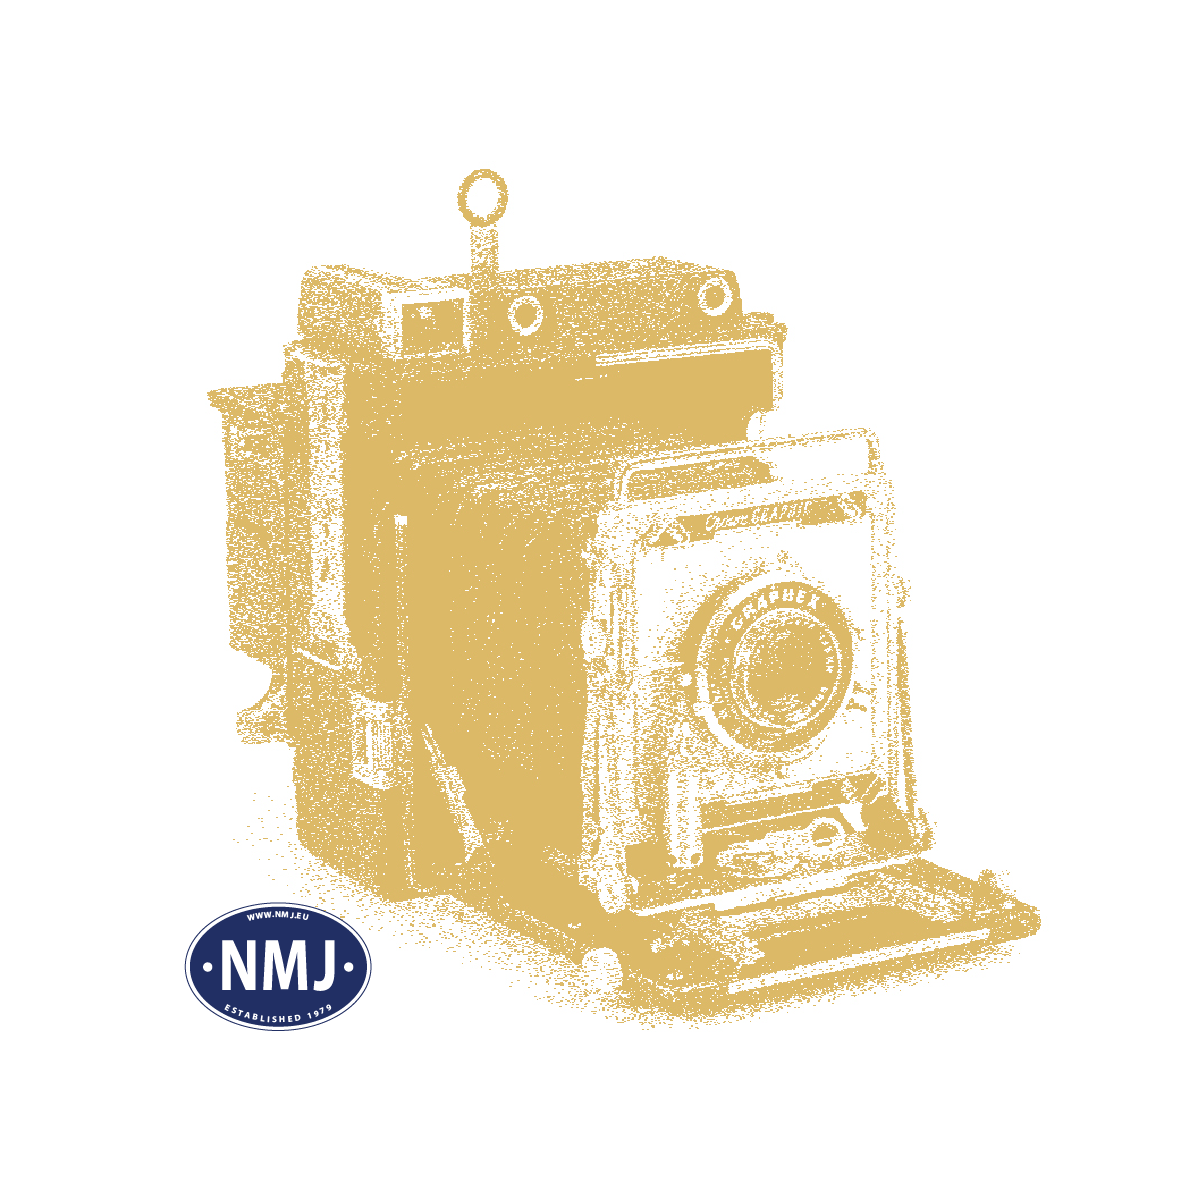 NMJST3-6 - NMJ Superline NSB T3 Stakevogn m/ Bremseplattform